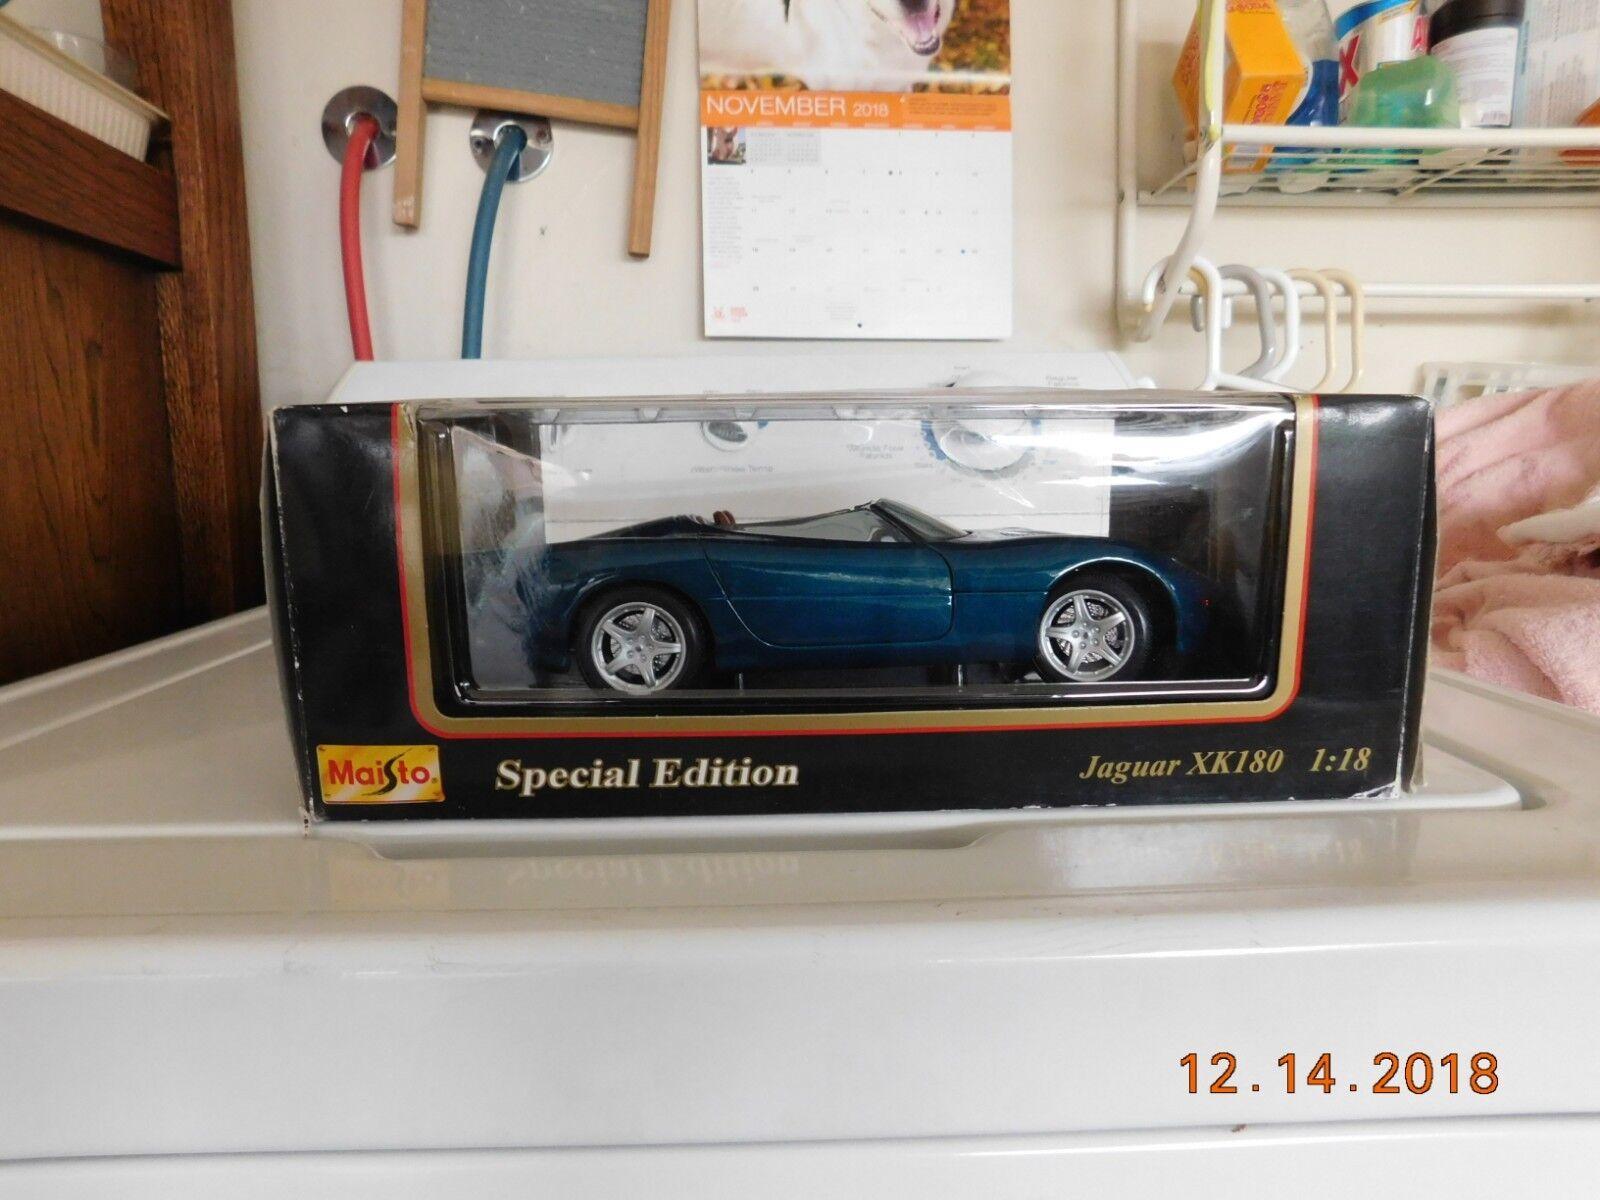 MAISTO Jaguar XK180 bluee congreenible XK 180 Special Edition 1 18